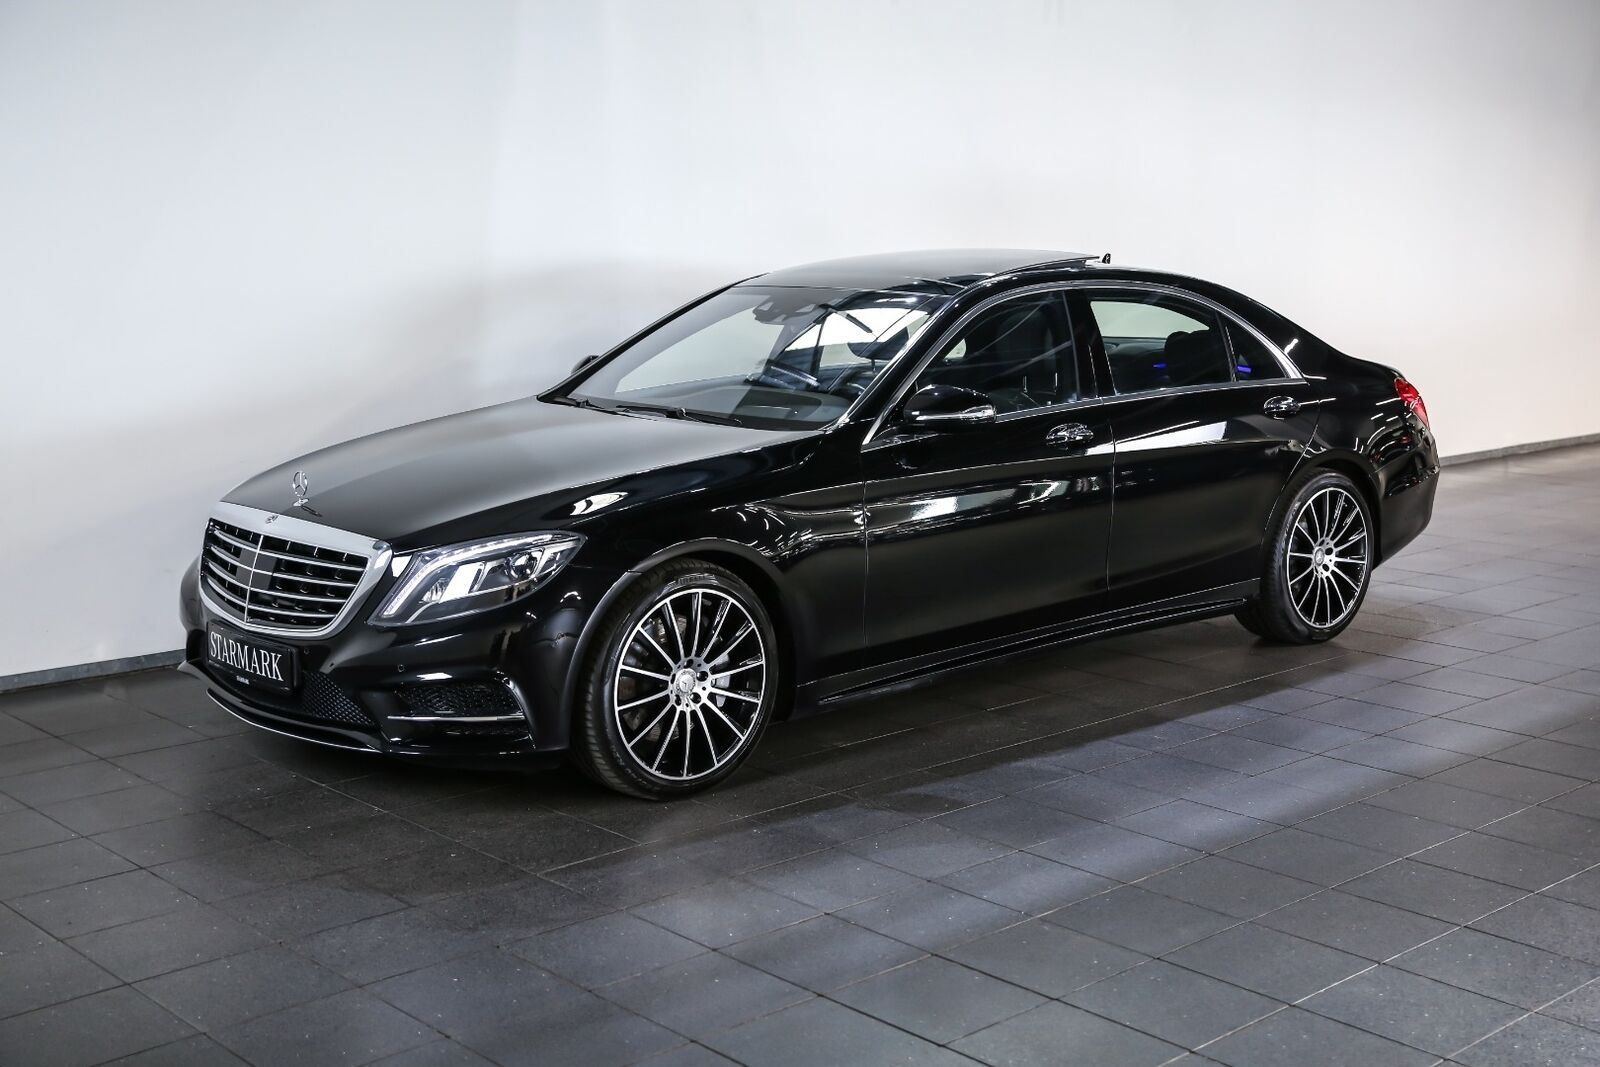 Mercedes-Benz S500 4,7 aut. 4Matic lang